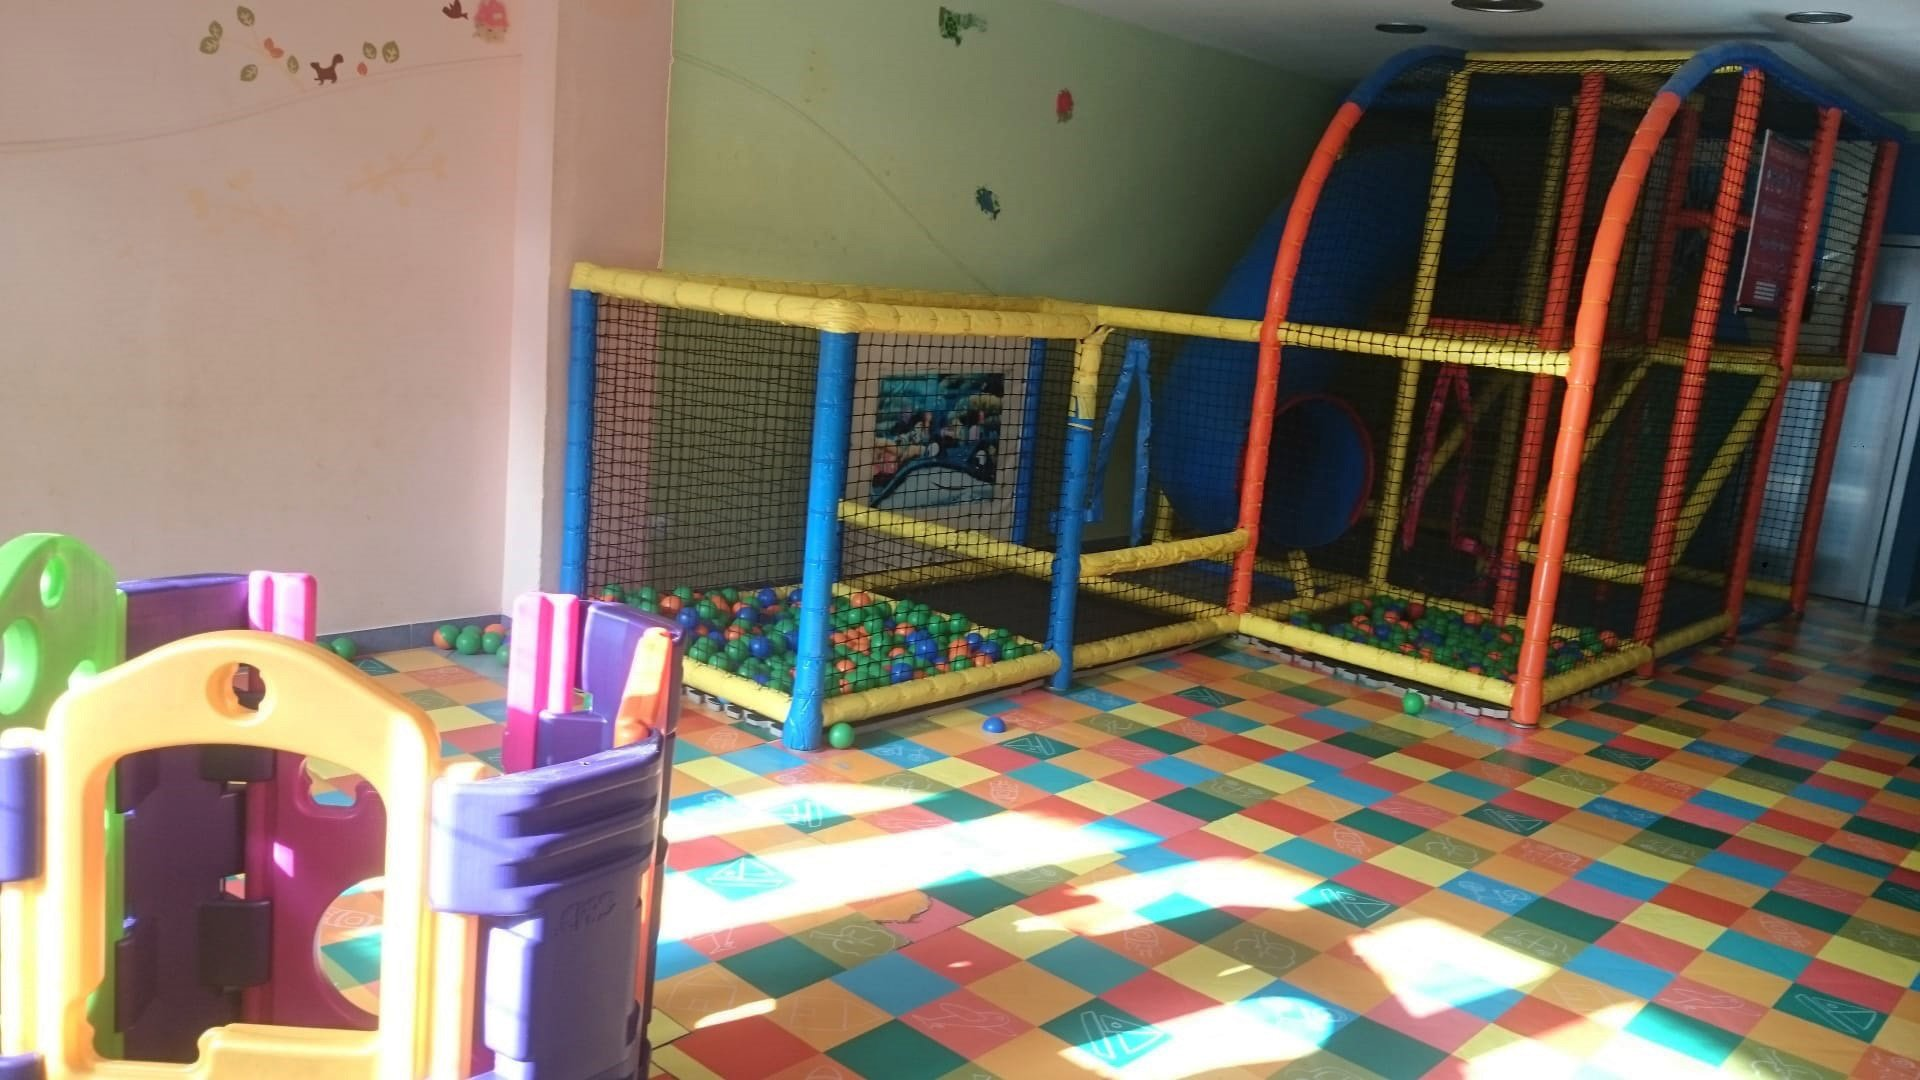 Parque de bolas en Cafetería Nemo de Benalmádena.